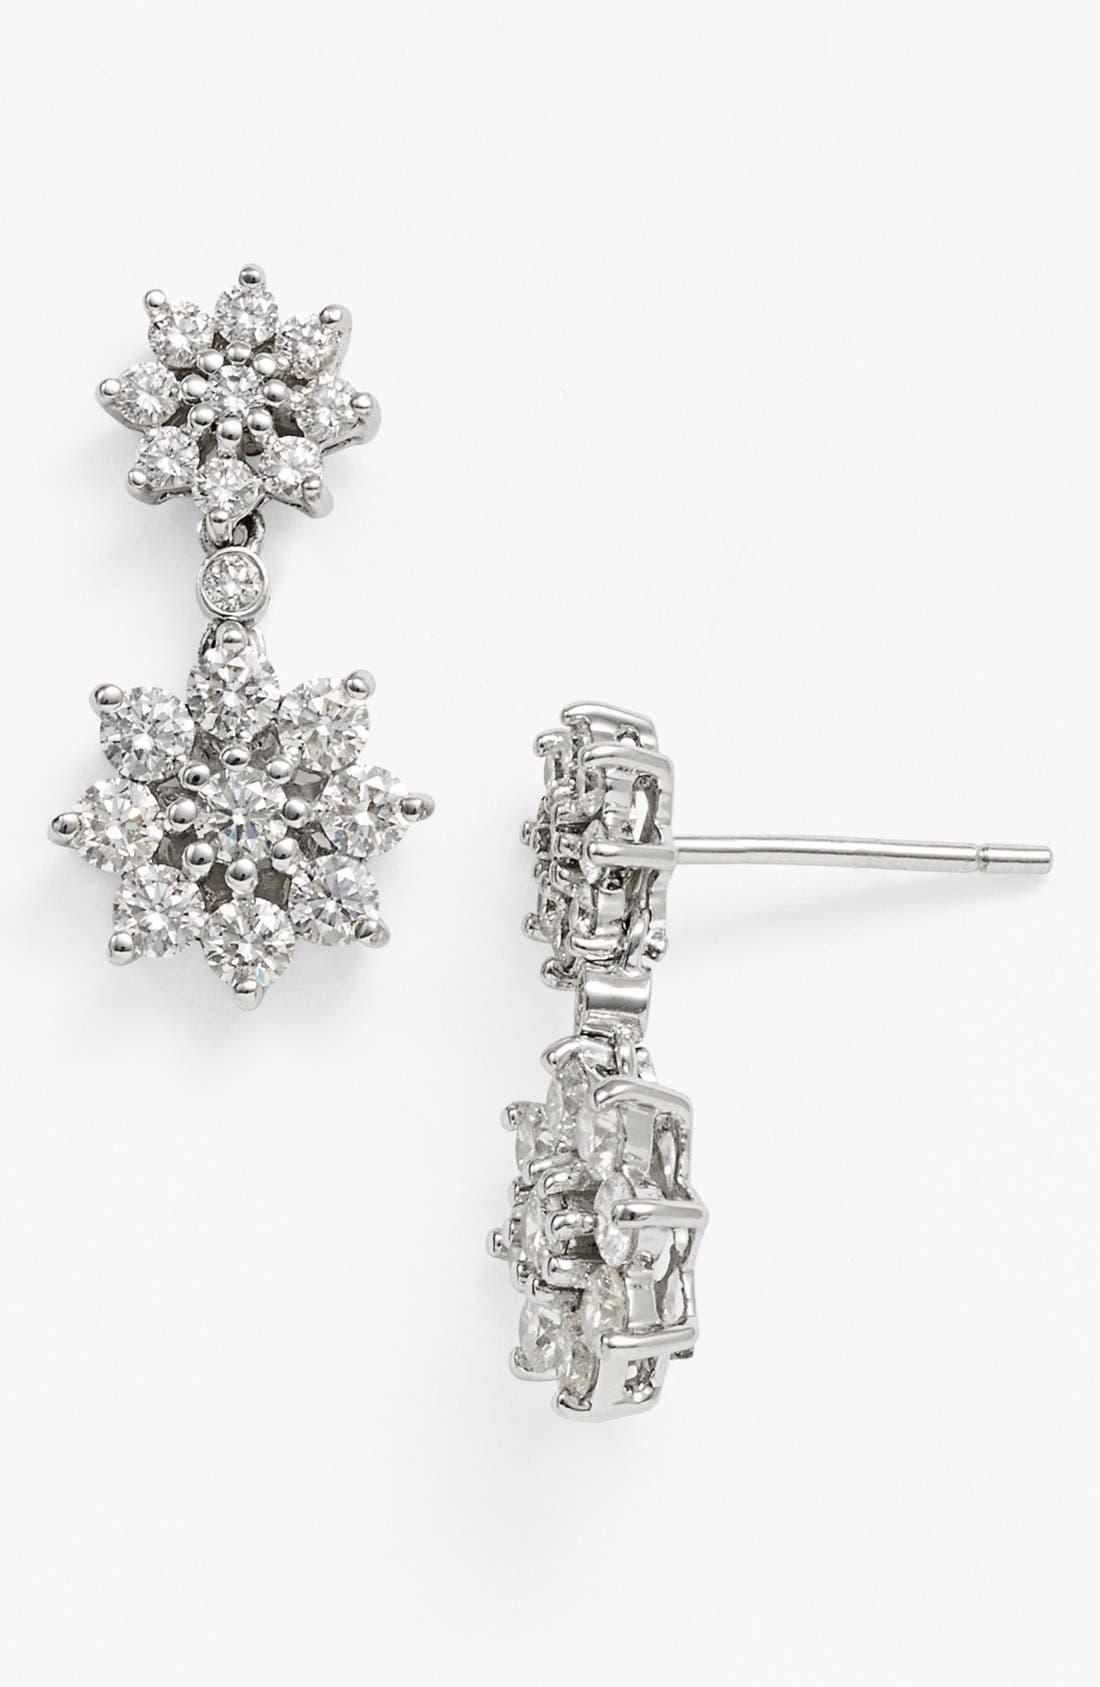 Main Image - Kwiat 'Blooms' Diamond